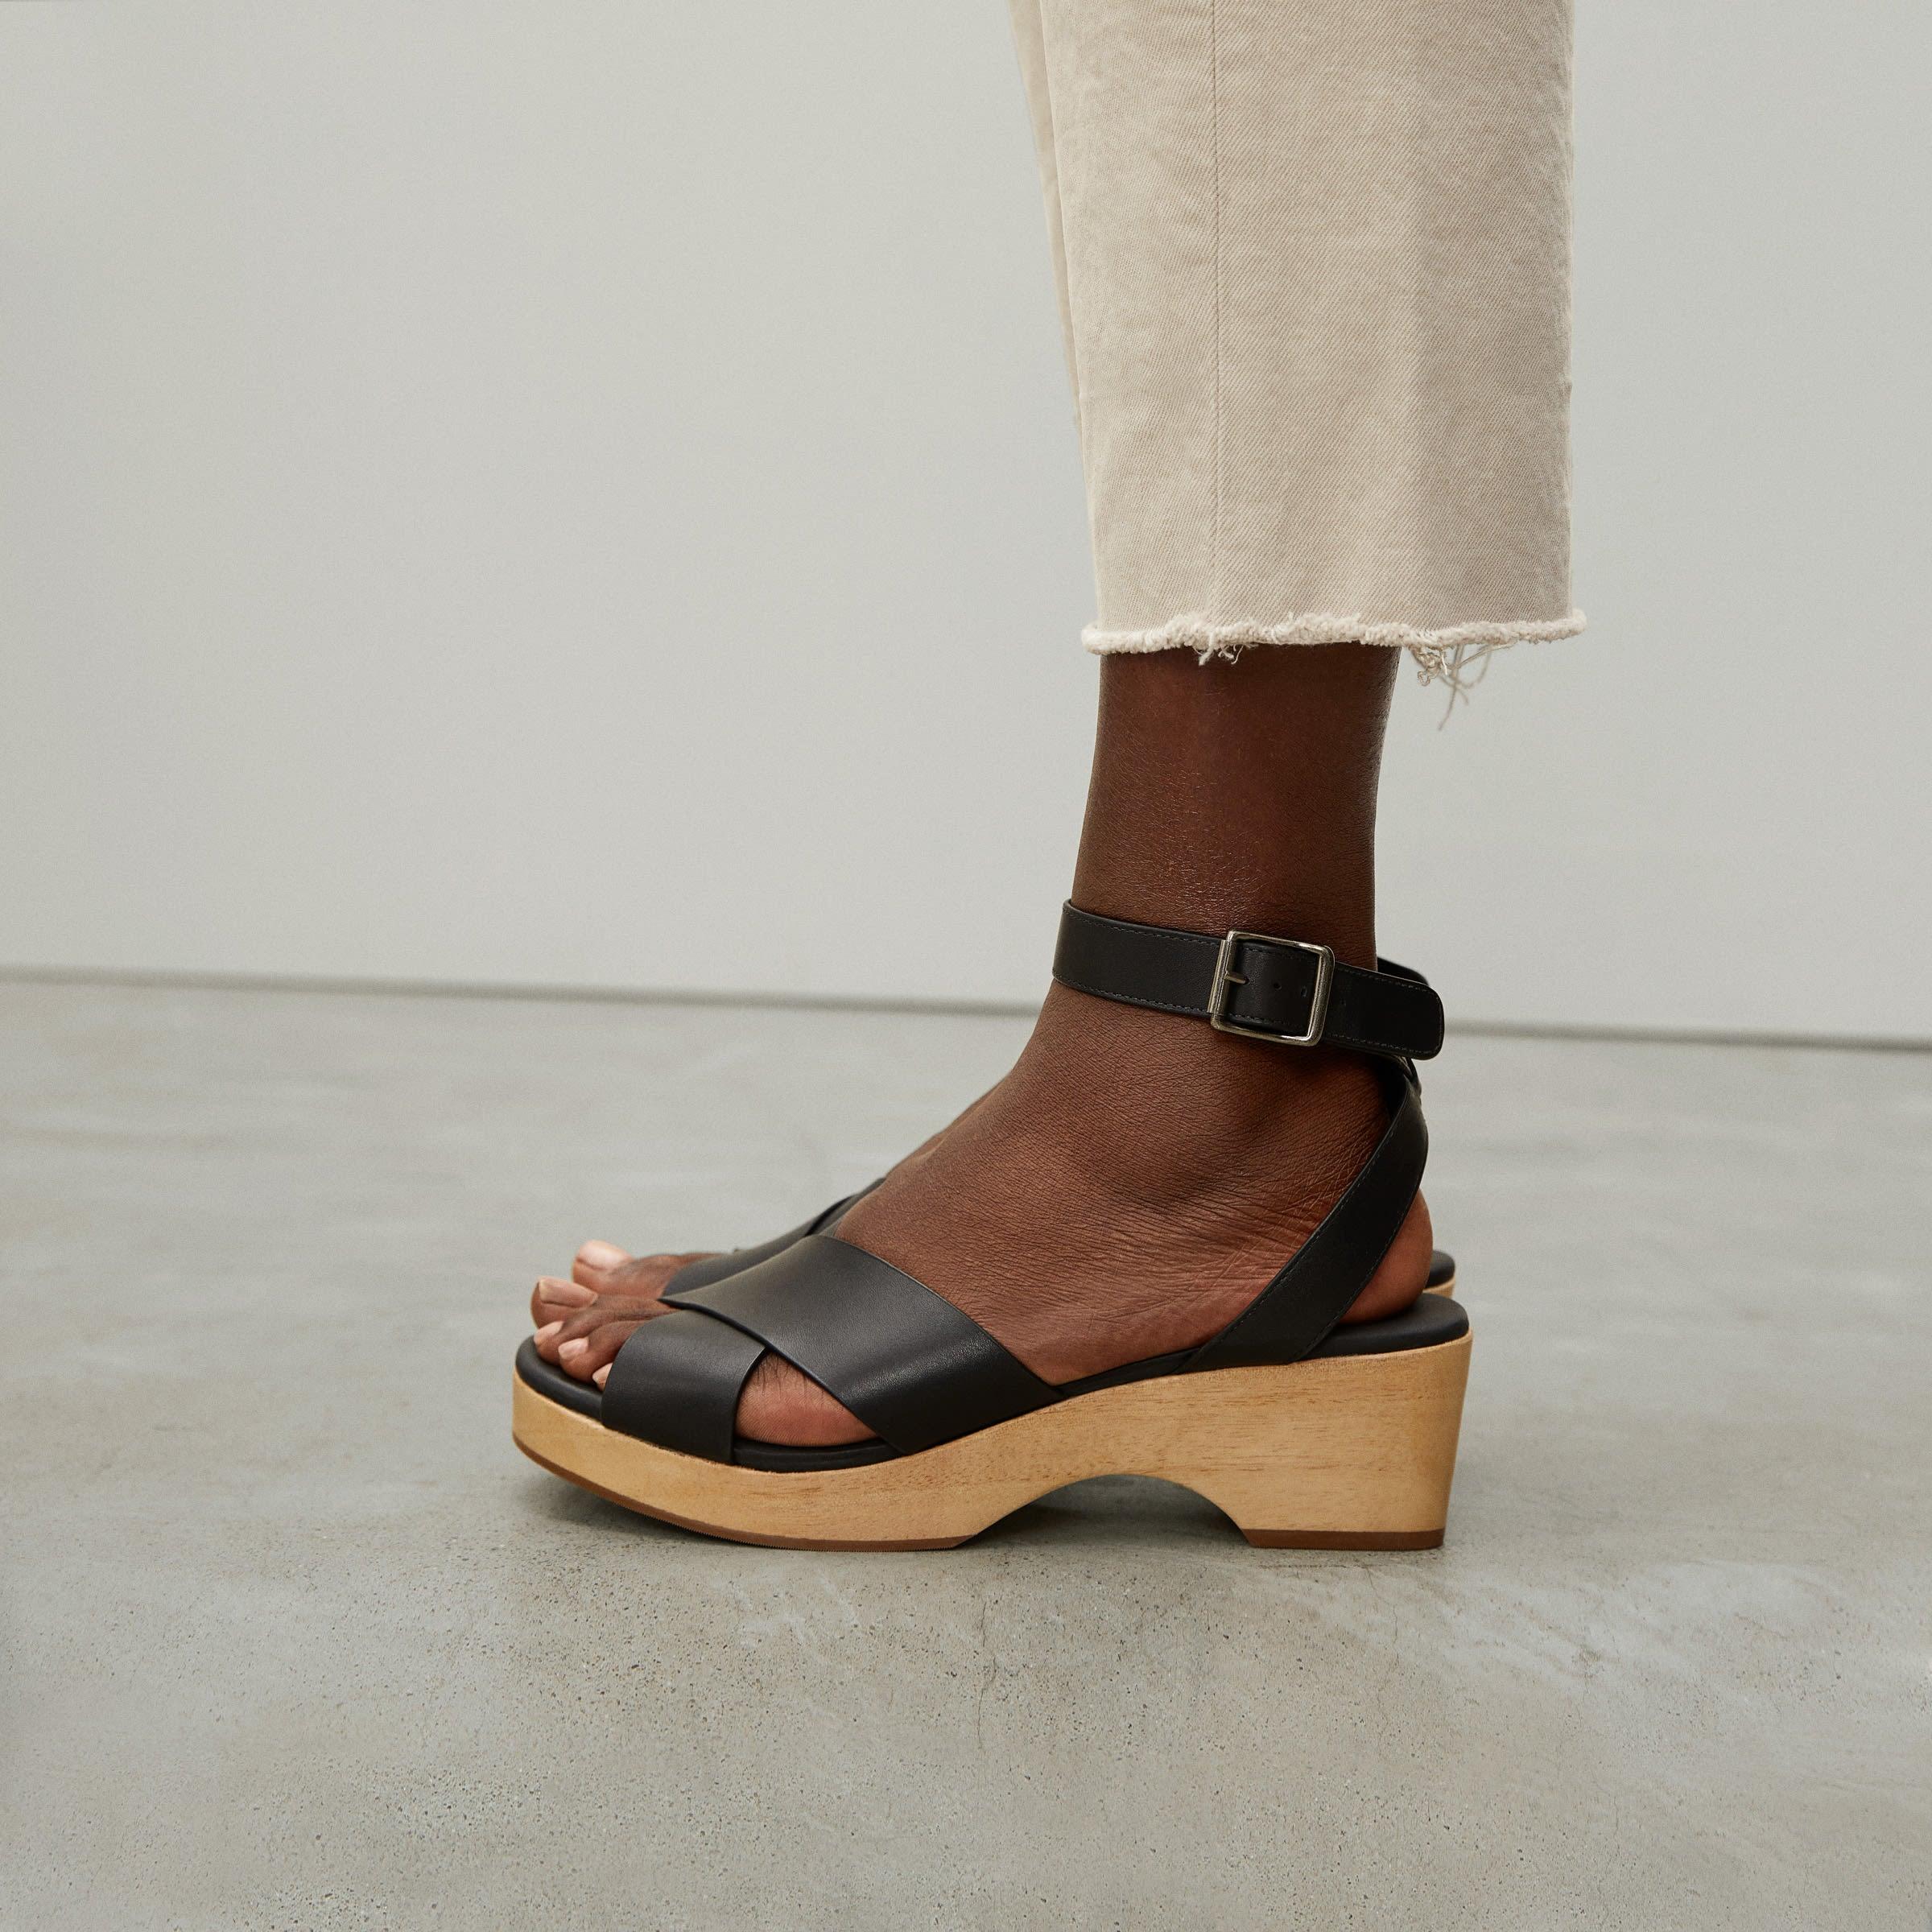 model wearing criss-cross strap in black with light wood sole